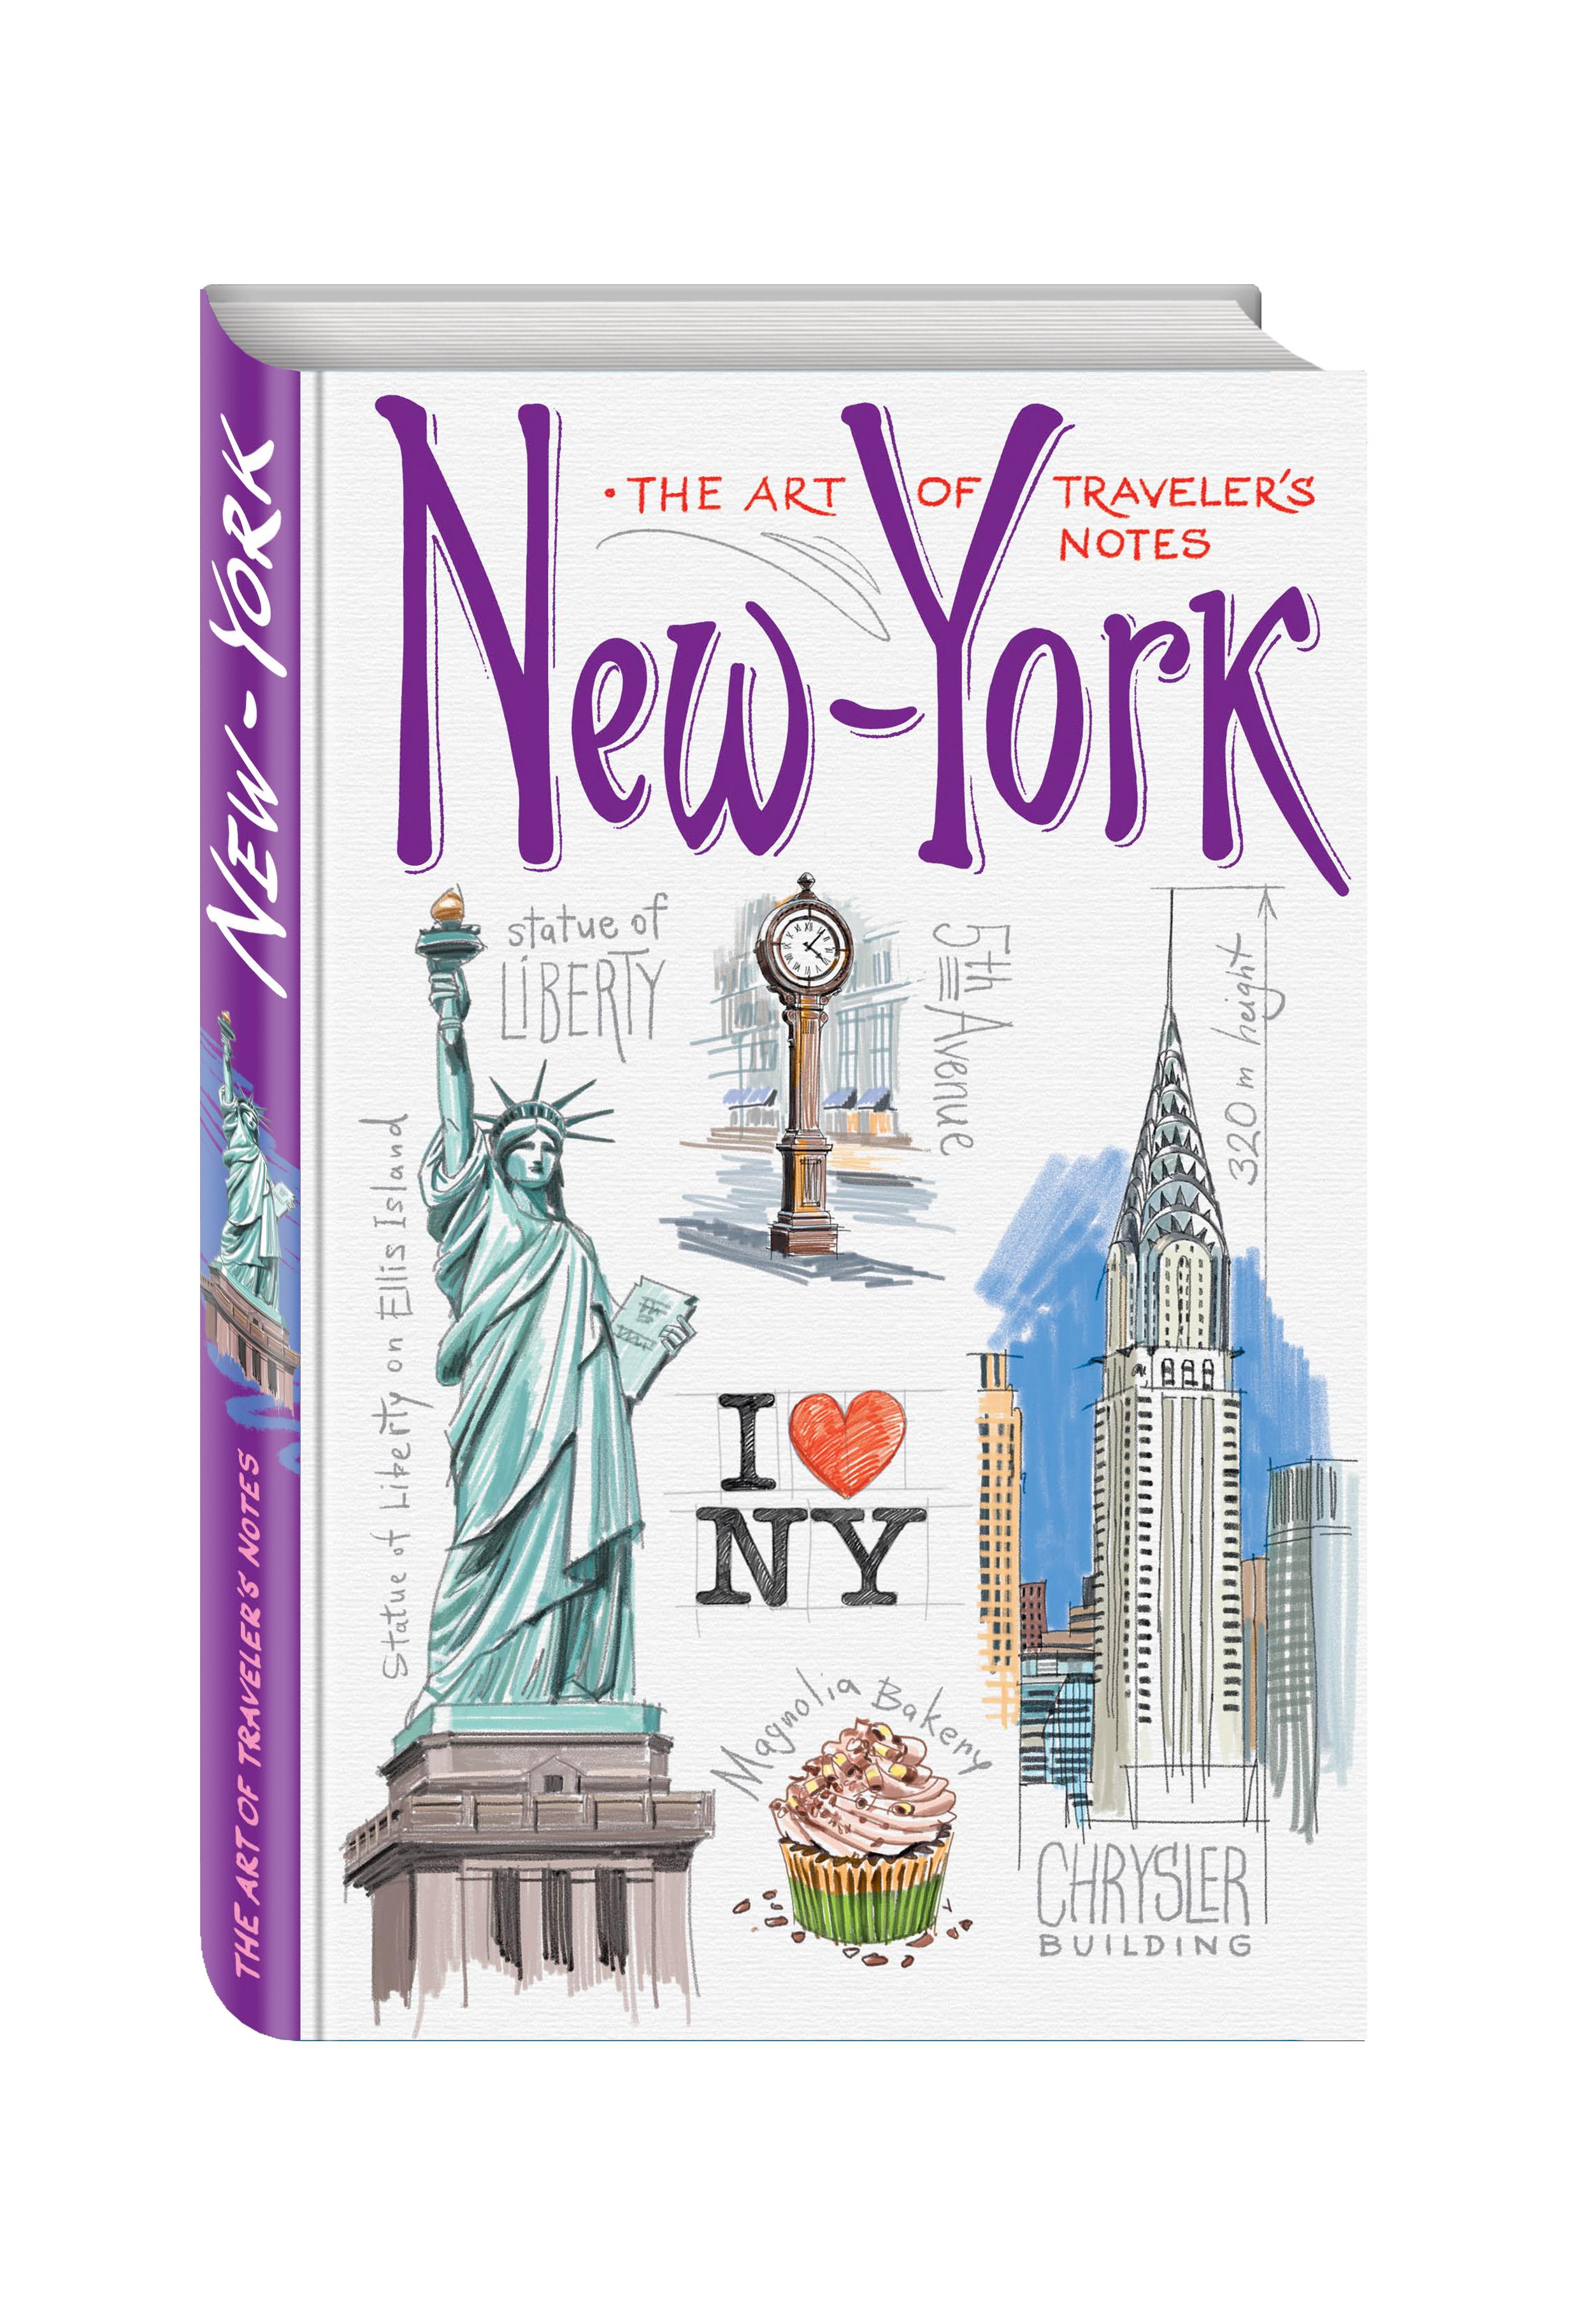 New York. The Art of traveler's Notes art of war